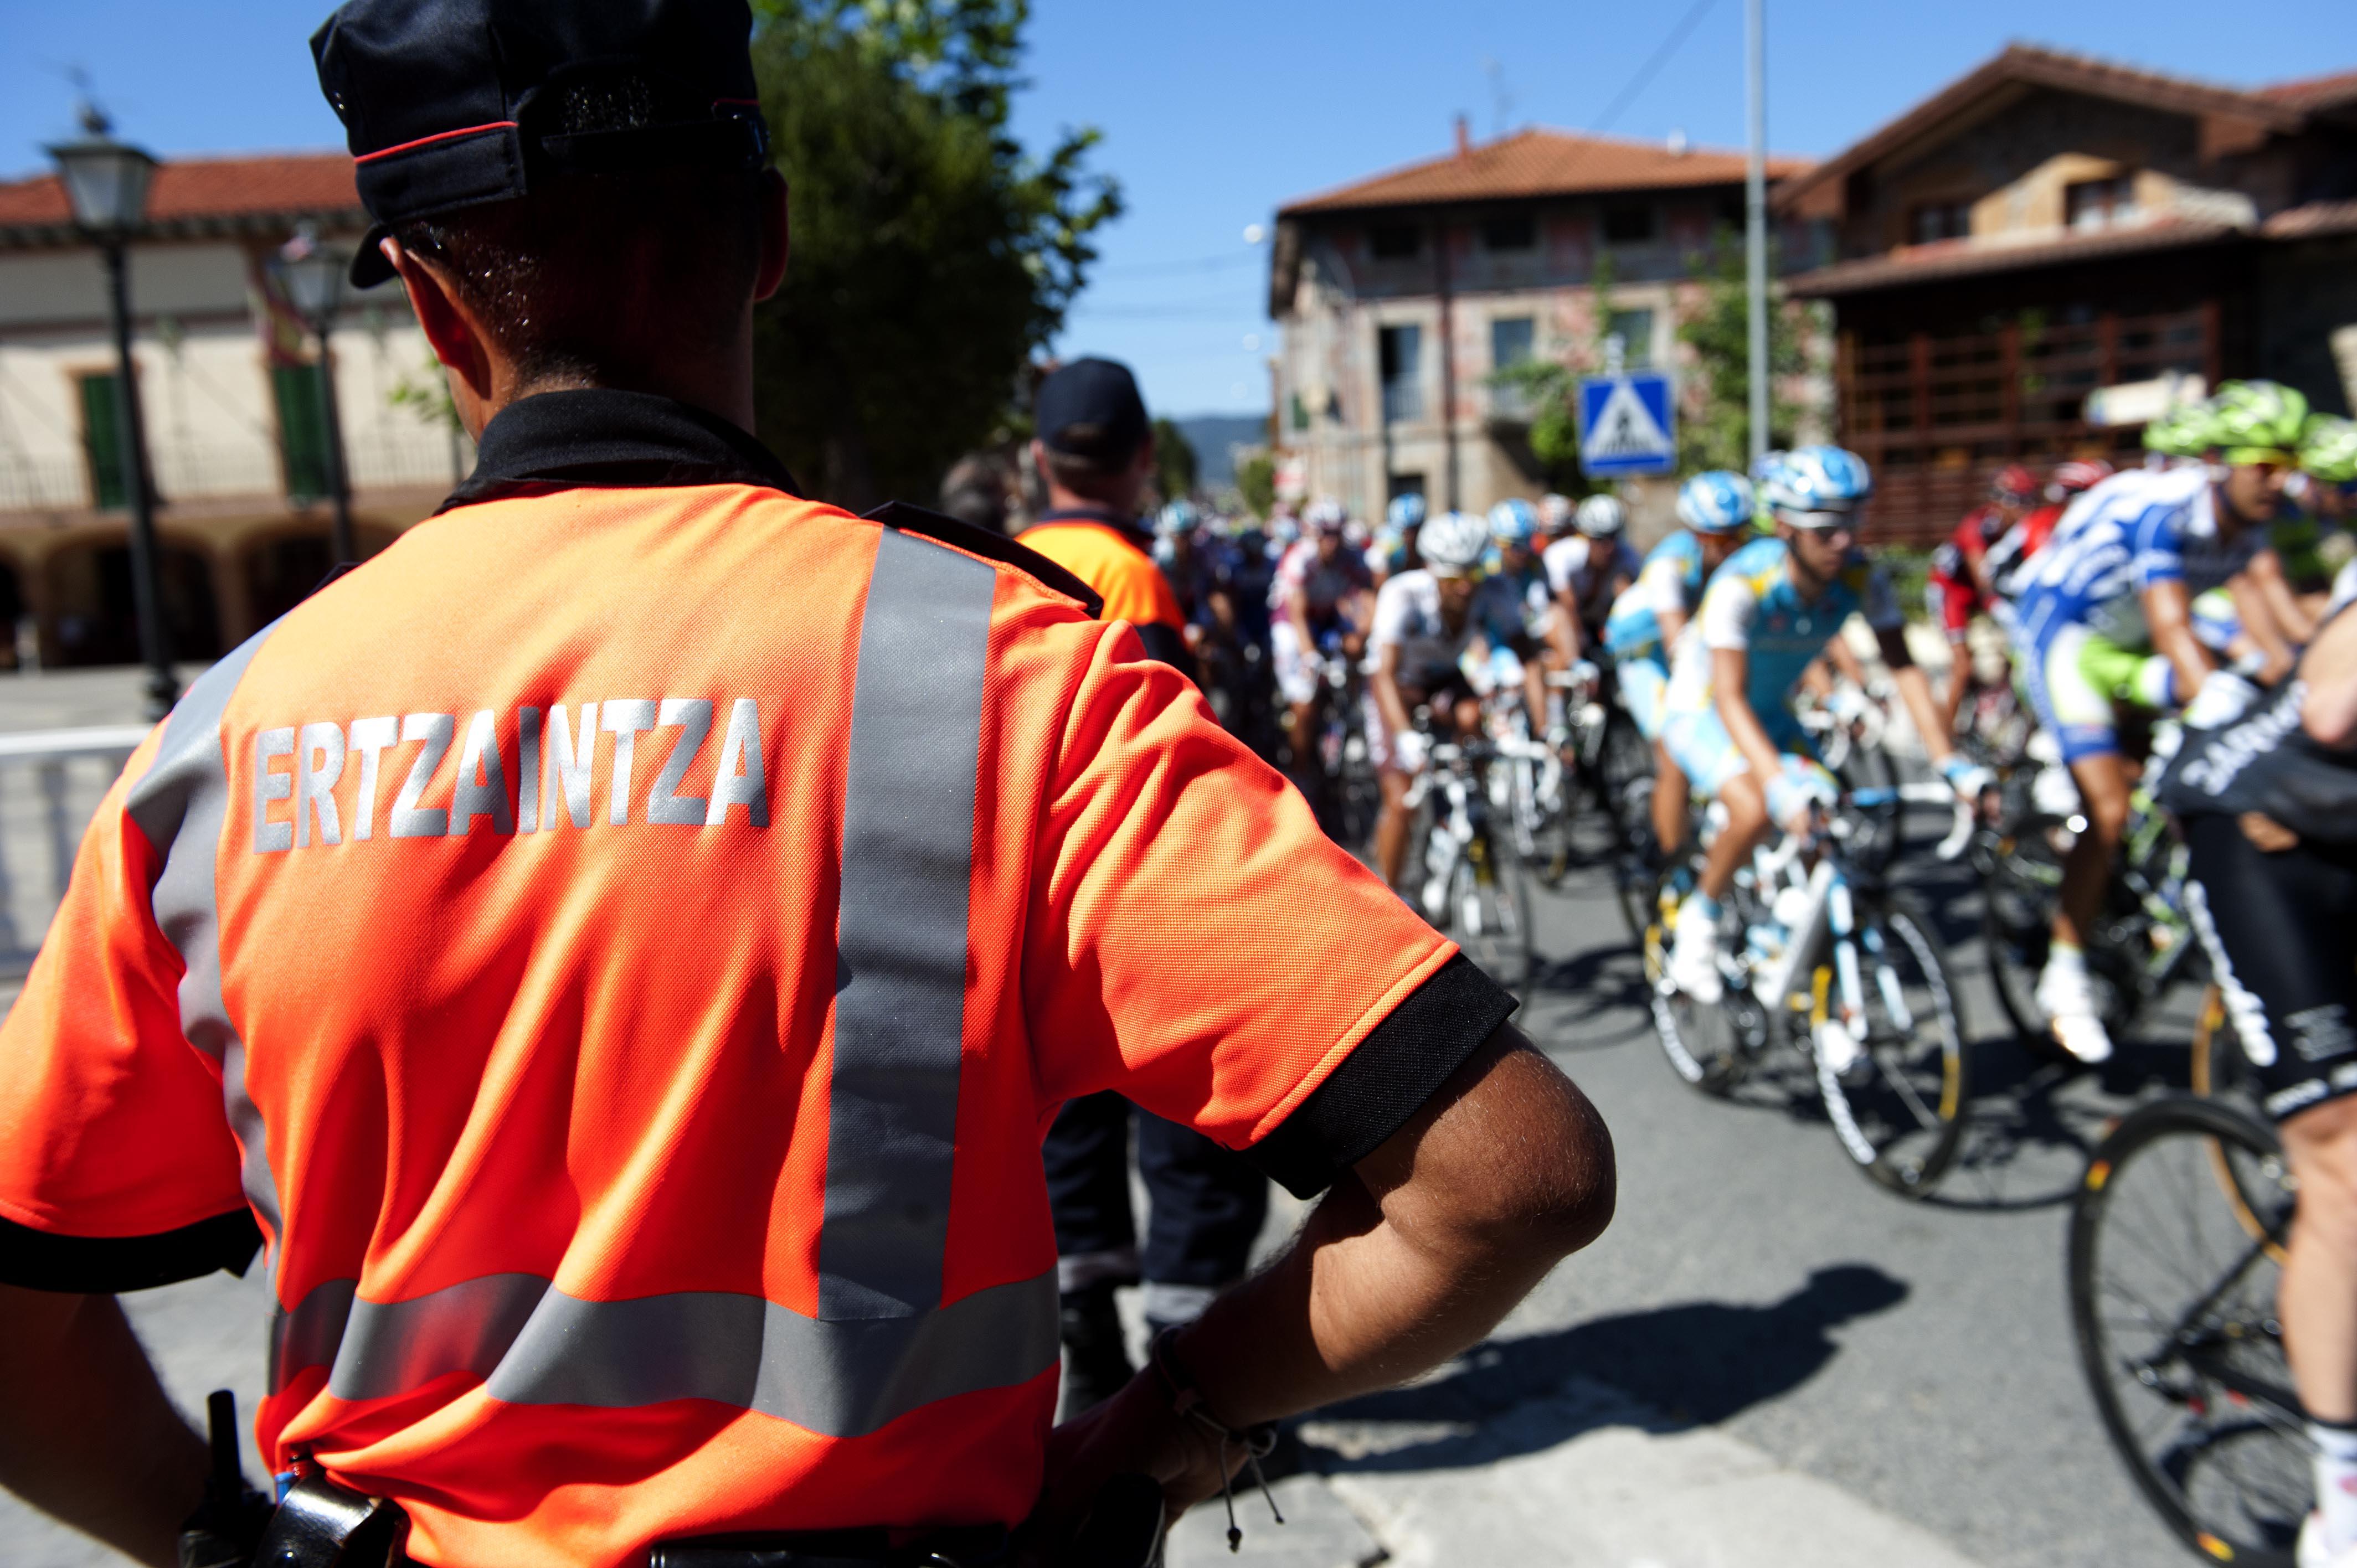 2011_09_09_interior_vuelta_agentes_marcha_cambio_peloton.jpg